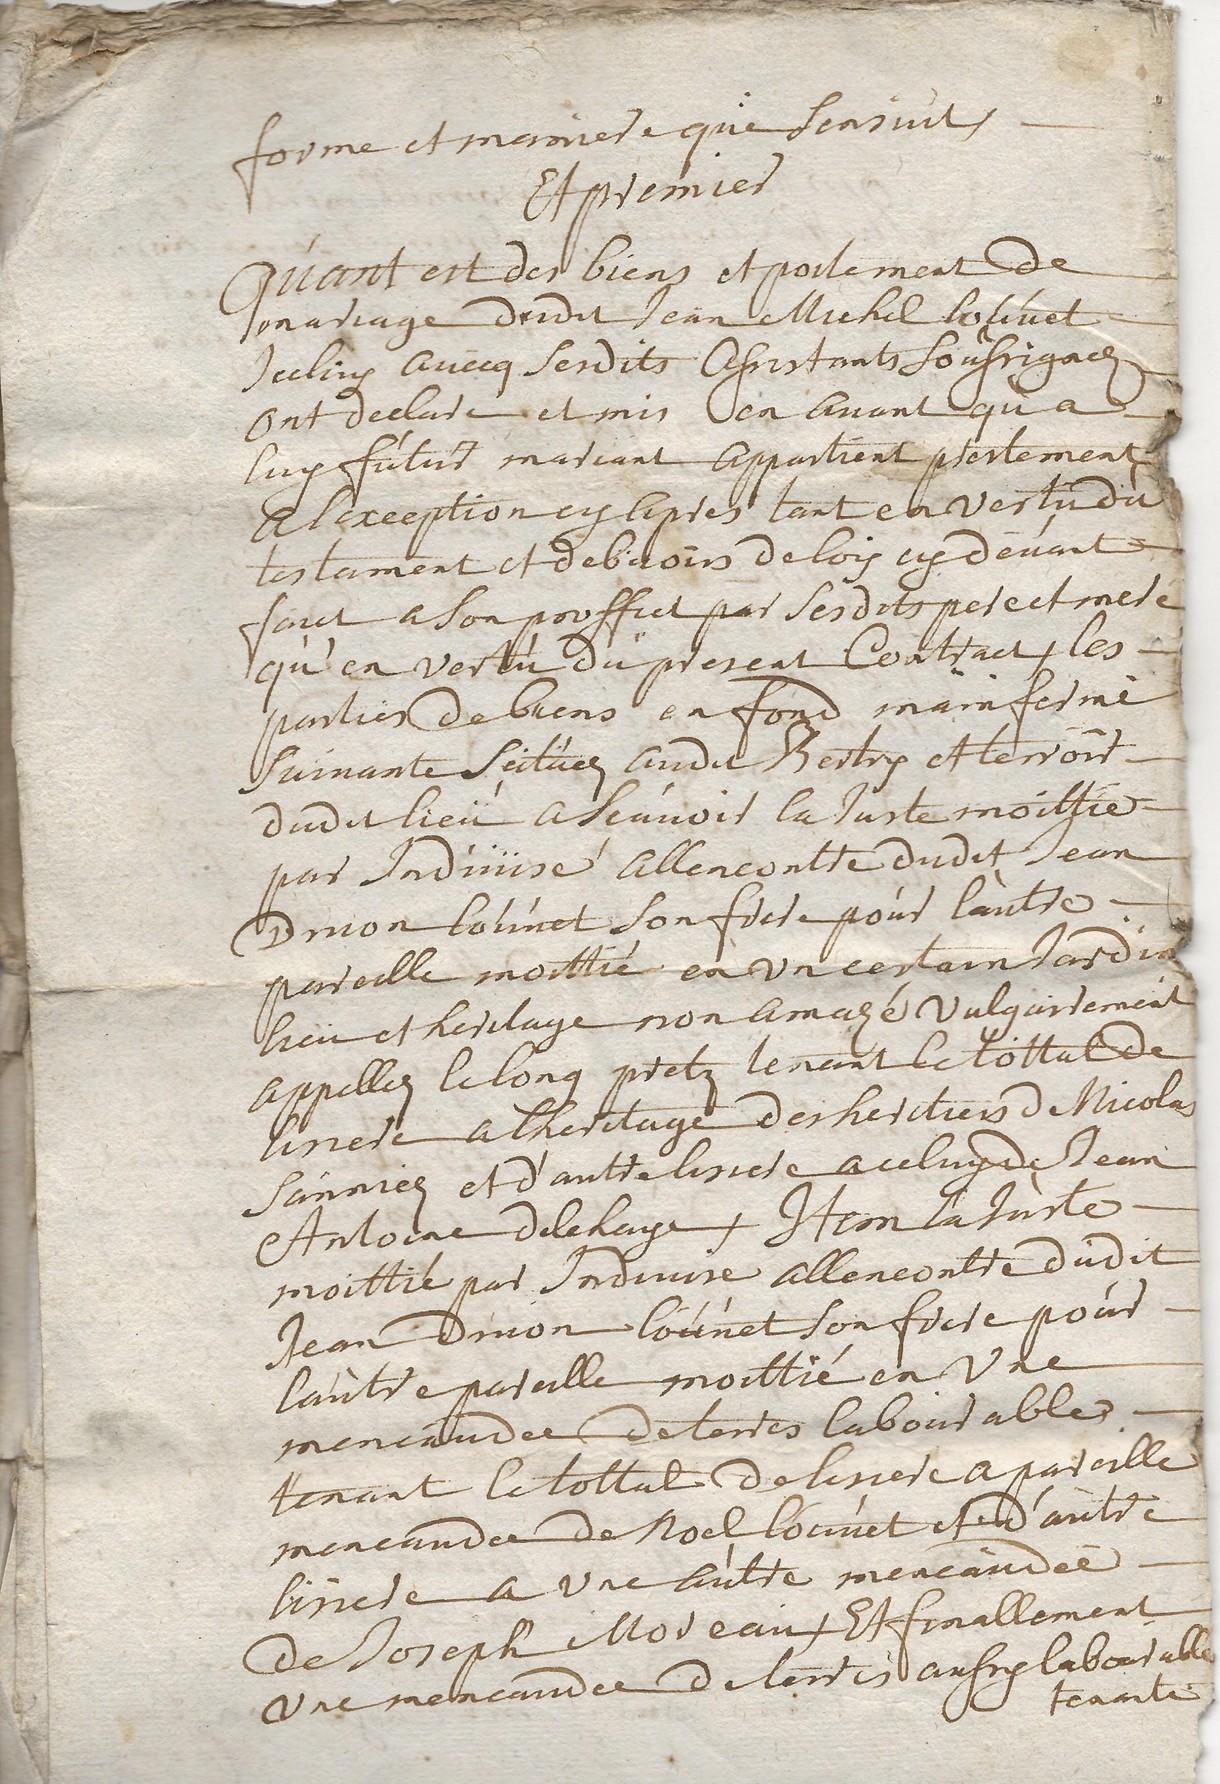 1734 ct mge jmichel louvet x anne catherine taisne 8 3